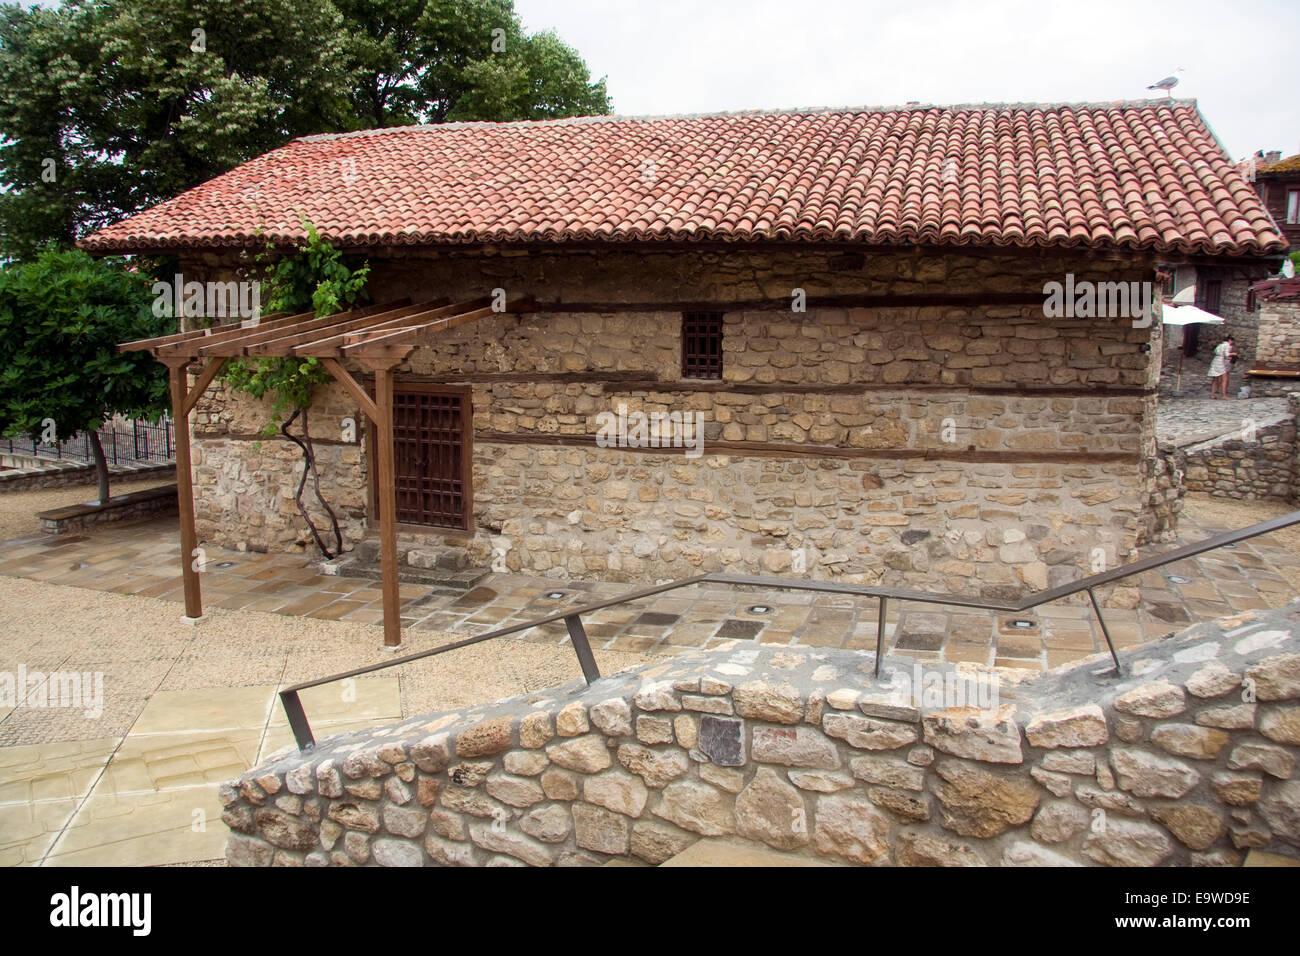 The Church of the Holy Saviour or Sveti Spas in the UNESCO World Heritage town of Nesebar, Bulgaria - Stock Image